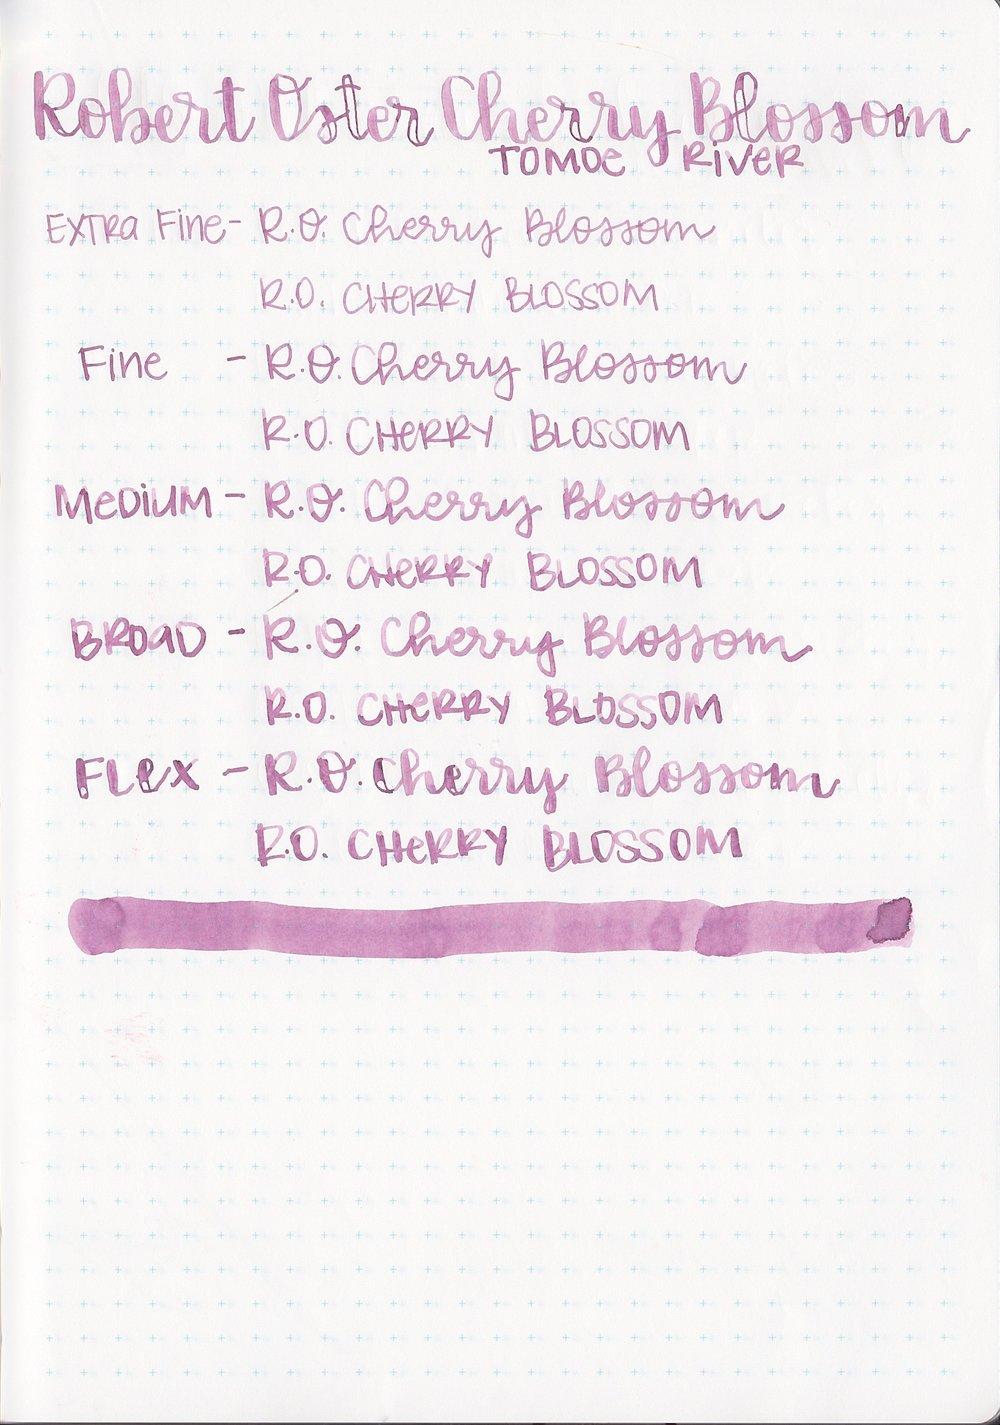 ROCherryBlossom - 8.jpg